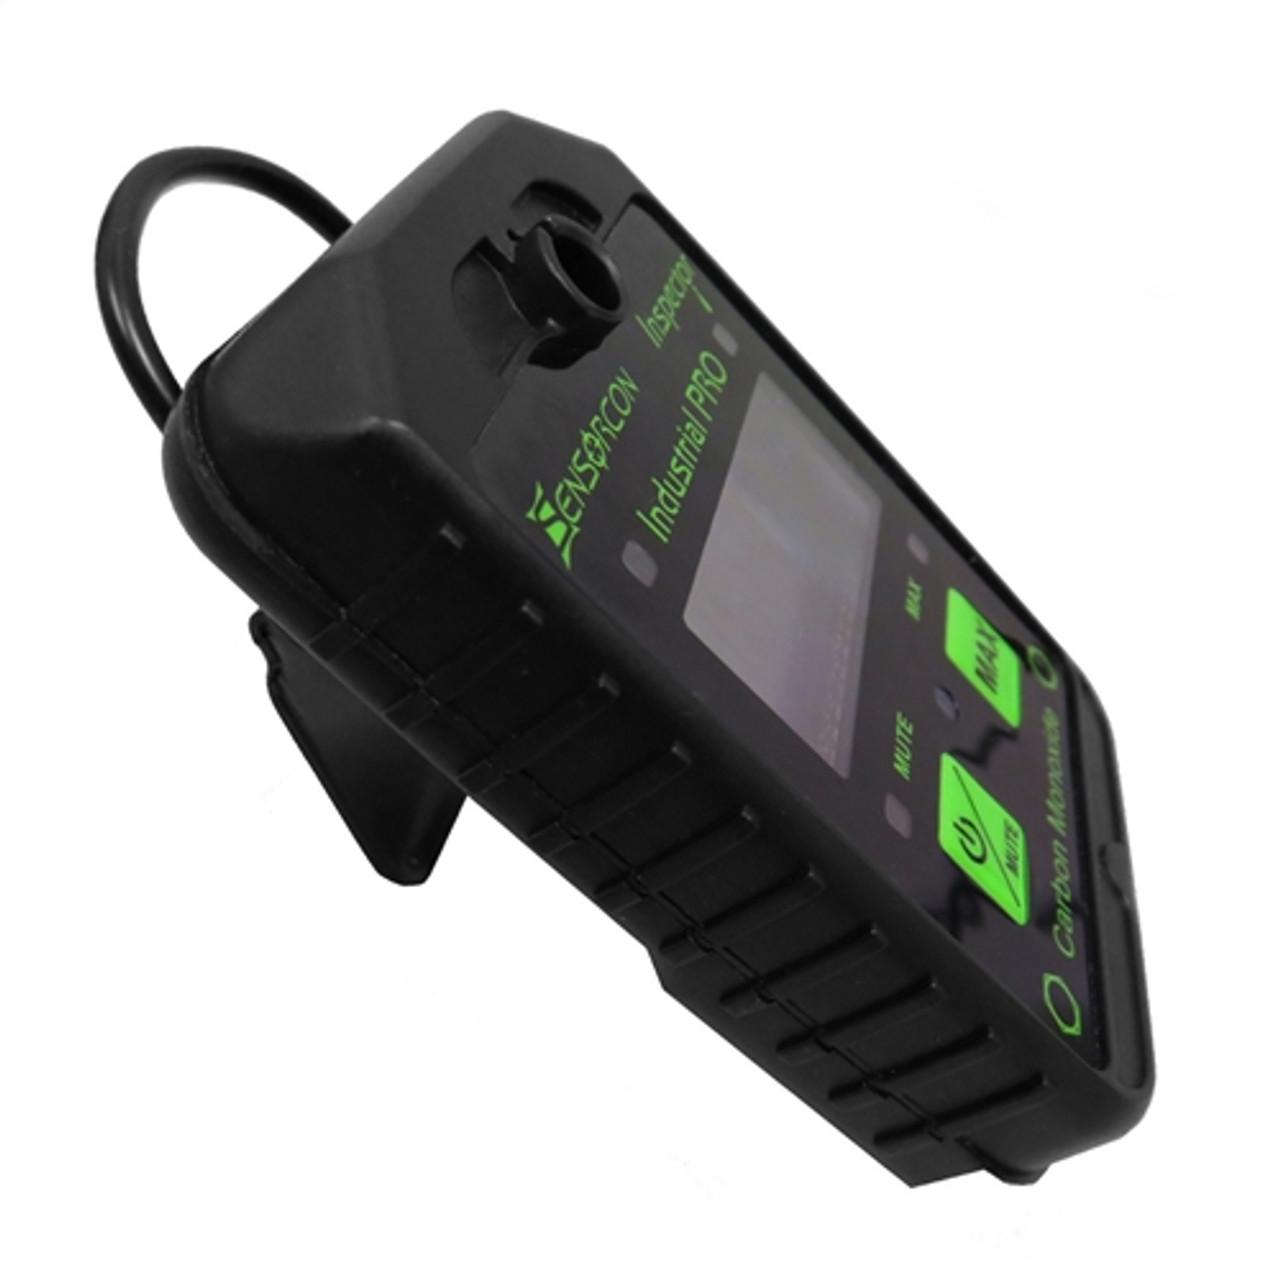 Sensorcon Inspector Industrial Pro (CO) Carbon Monoxide Detector Meter - INS-CO-IND-PRO